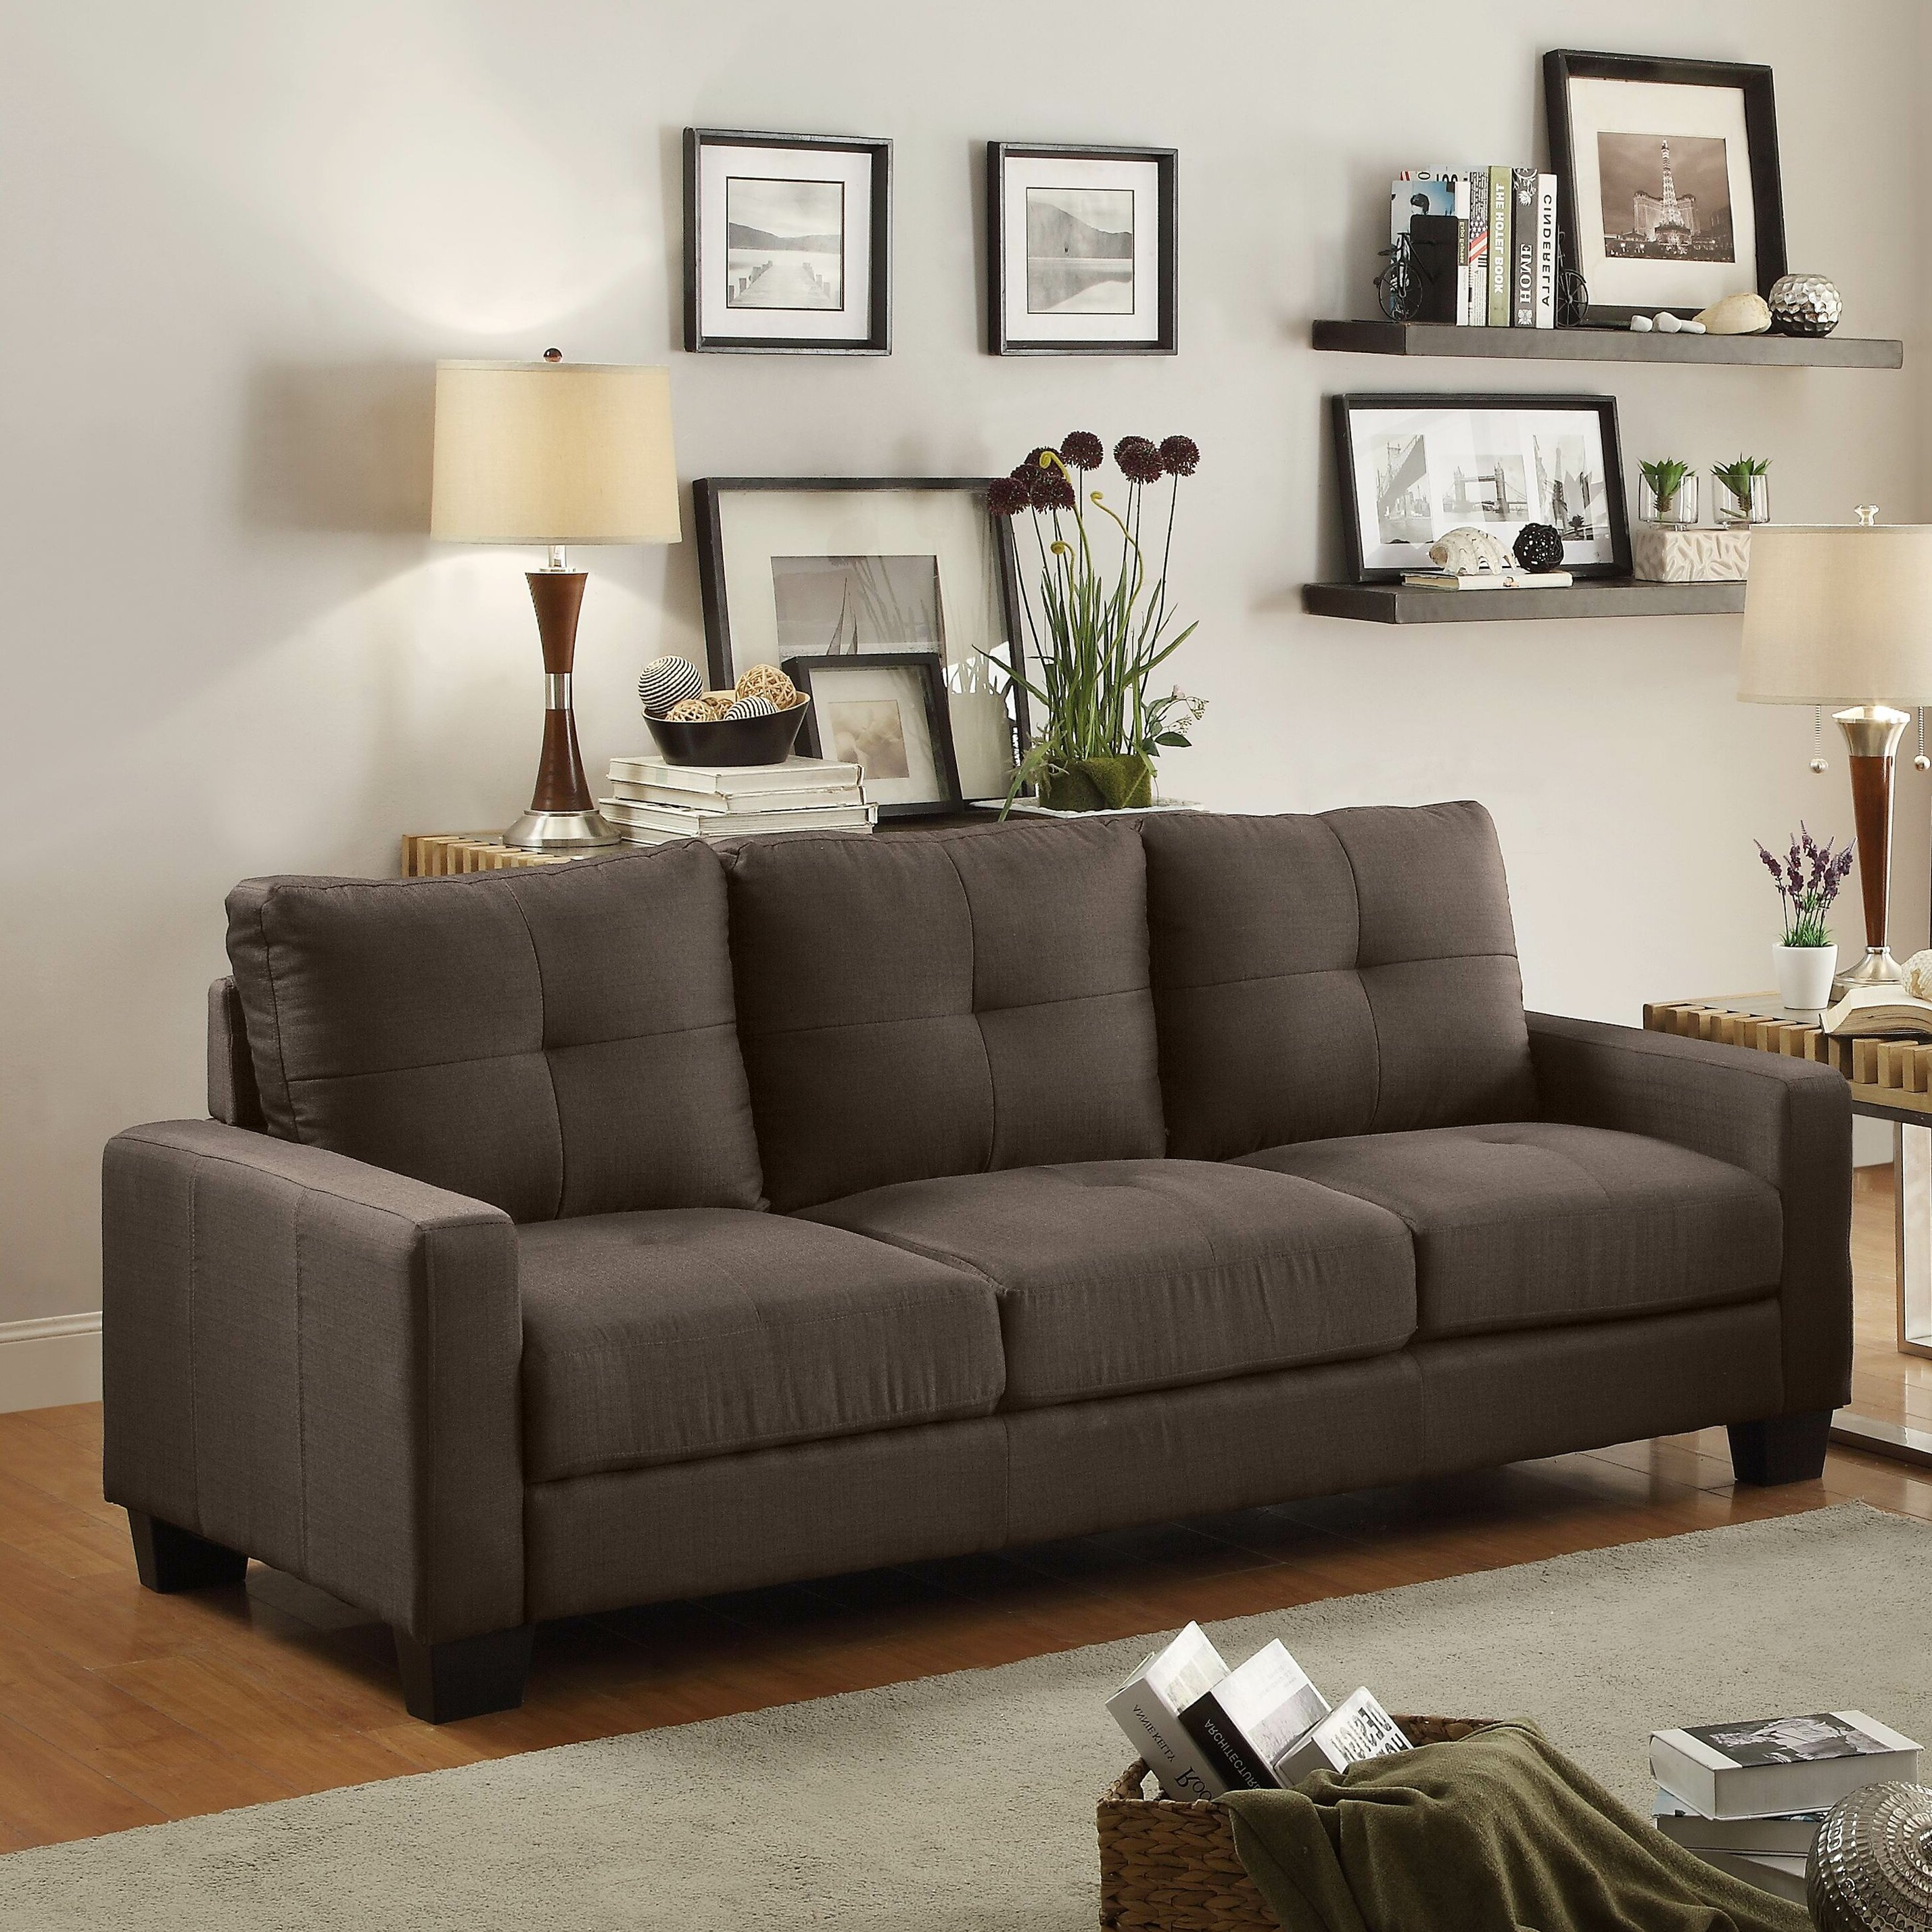 woodhaven hill ramsey sofa reviews wayfair. Black Bedroom Furniture Sets. Home Design Ideas